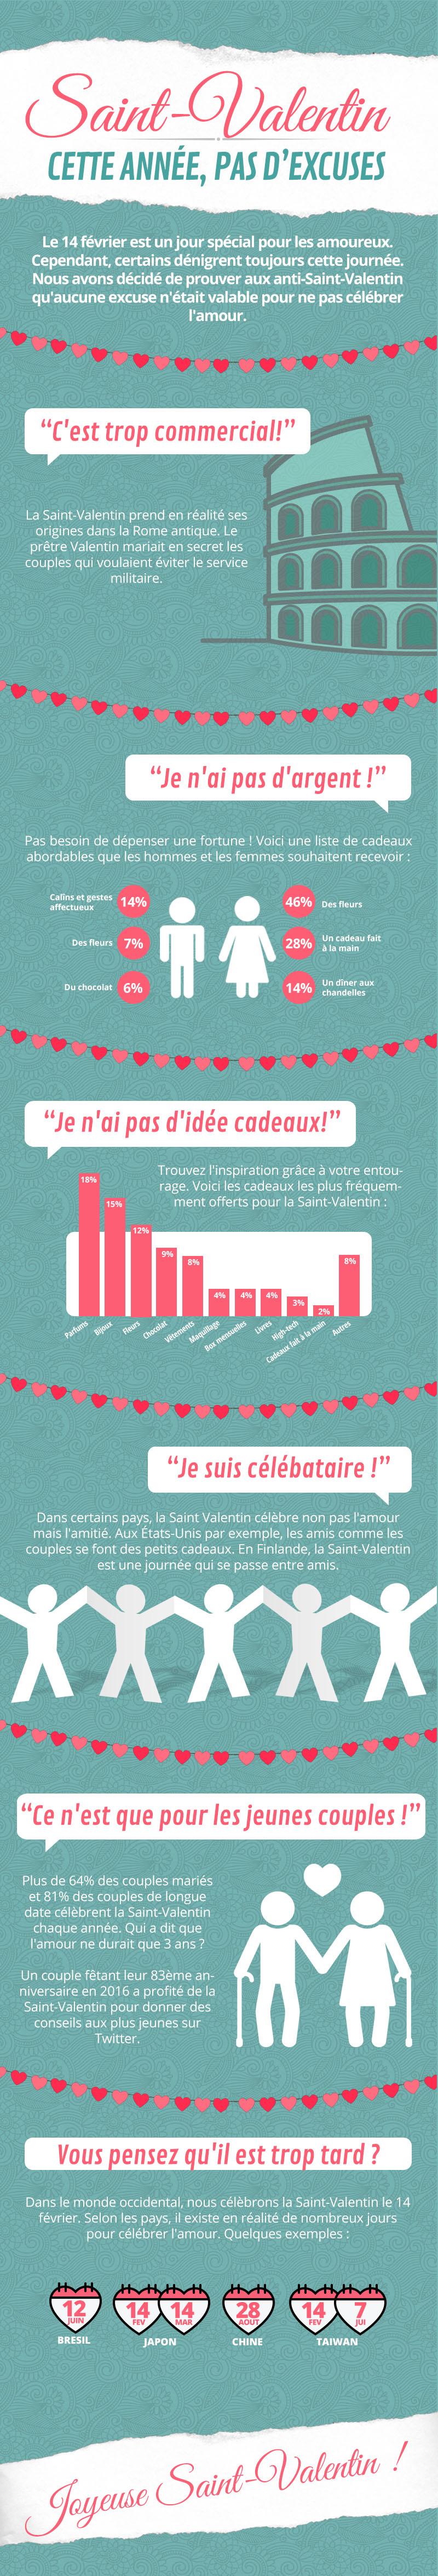 Infographie - Saint-Valentin